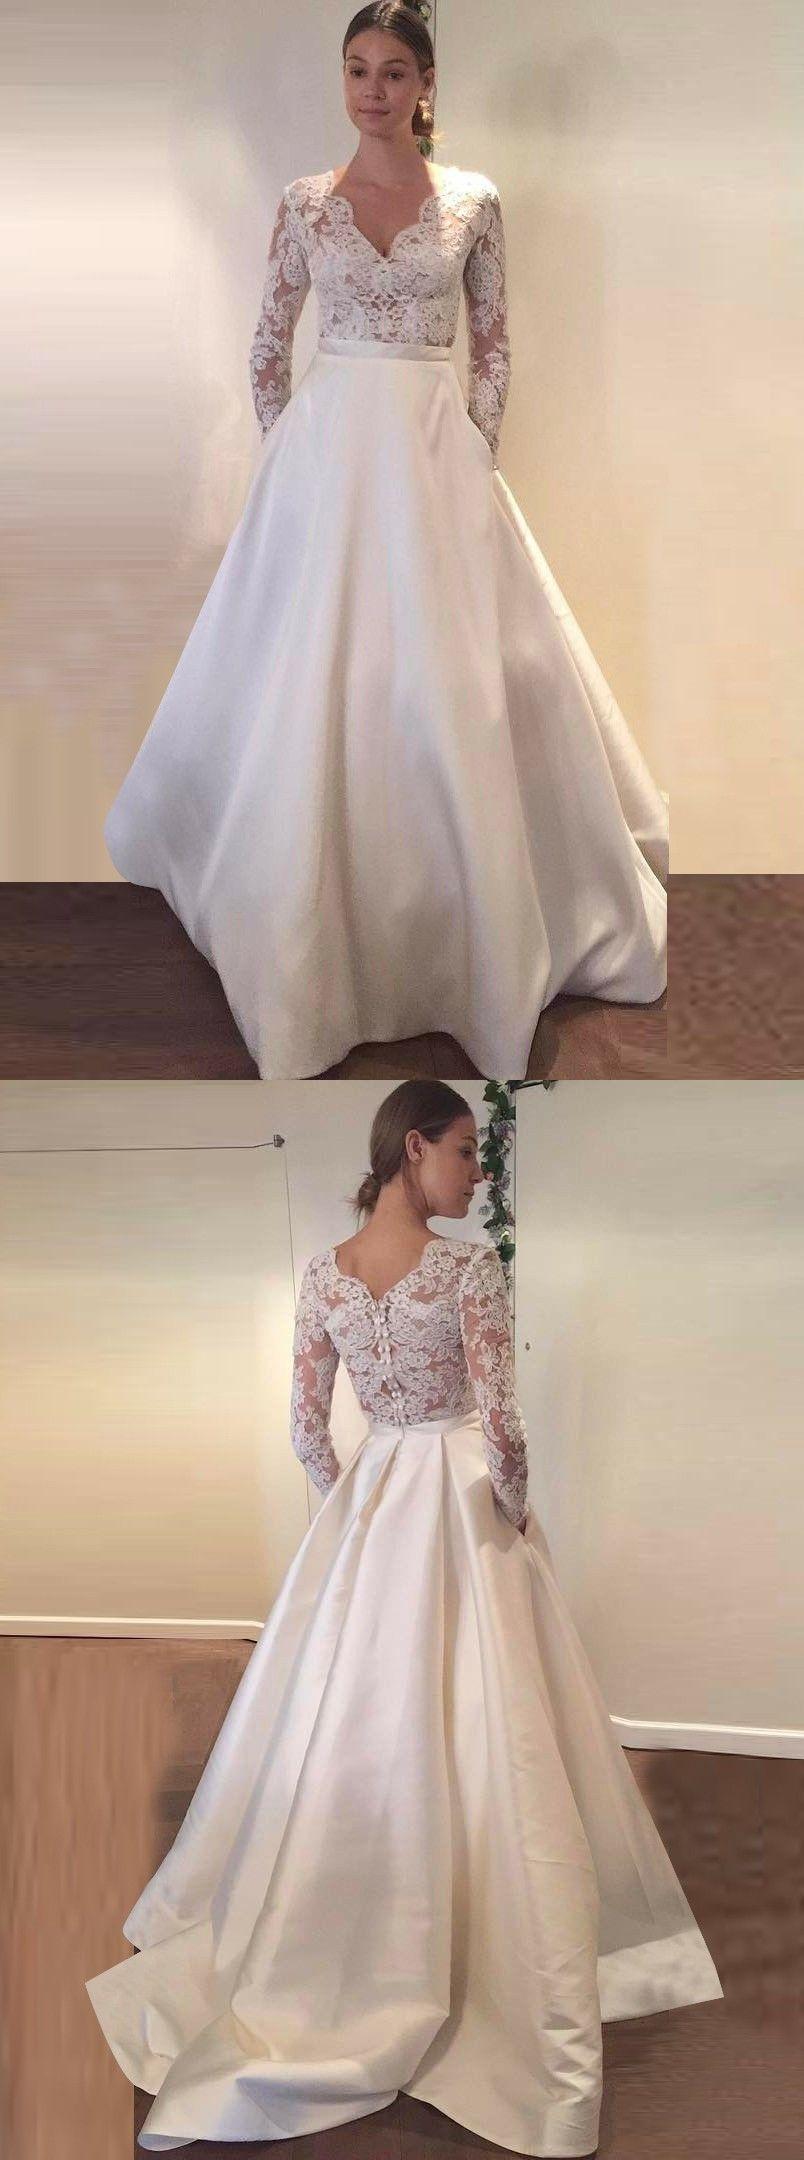 Aline scallopededge long sleeves satin wedding dress with pockets